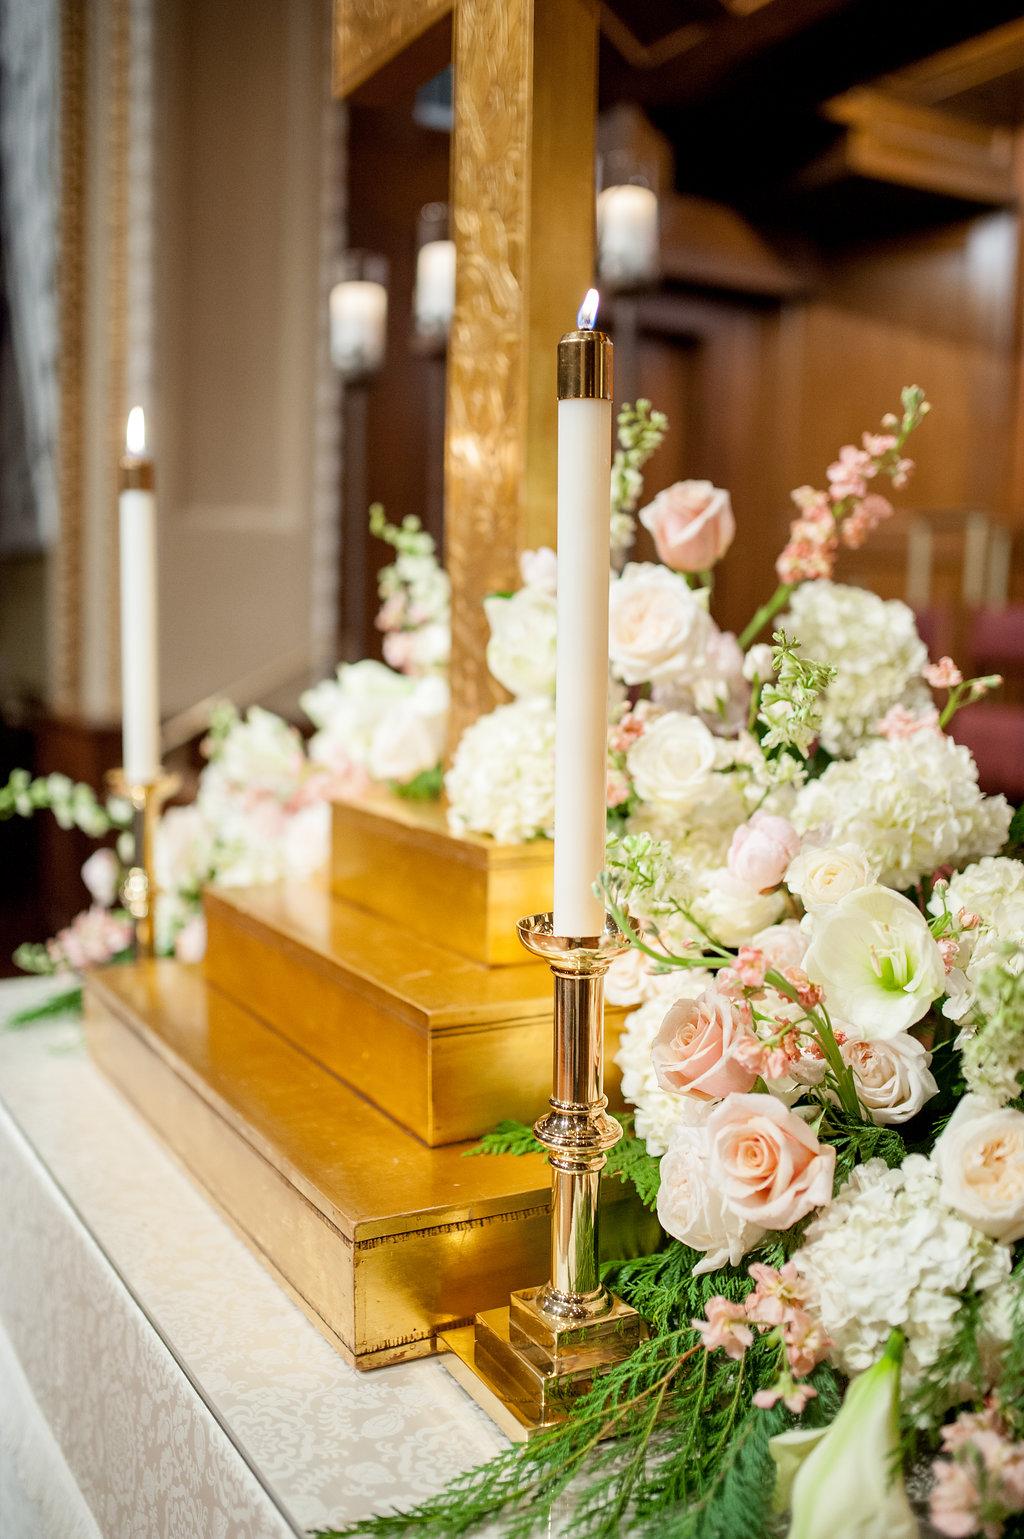 Gulf Coast wedding flowers